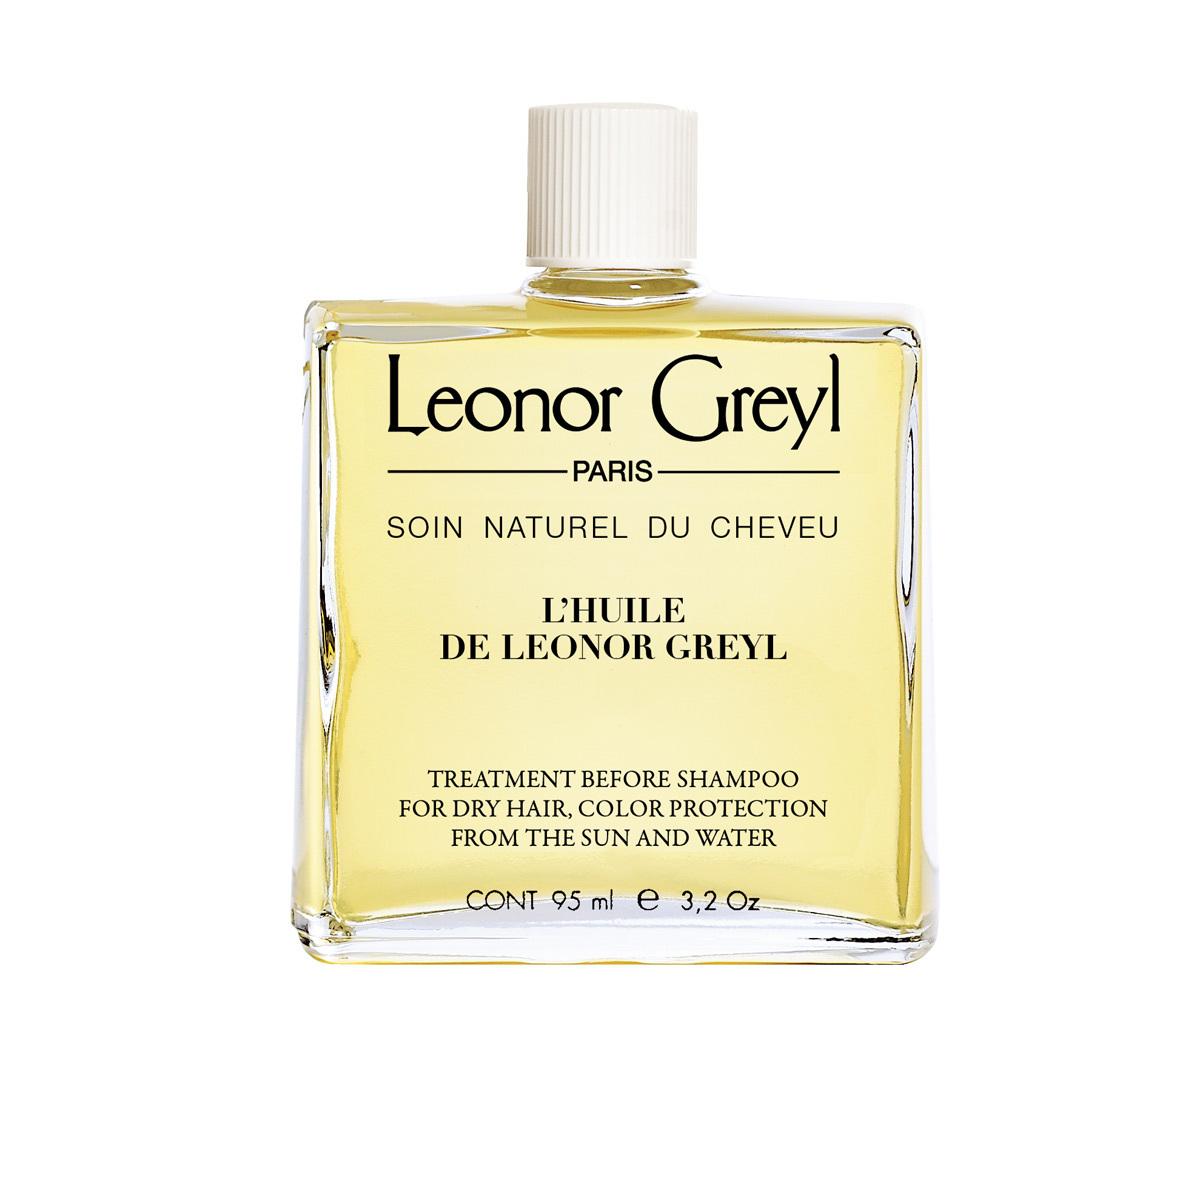 L'Huile de Leonor Greyl